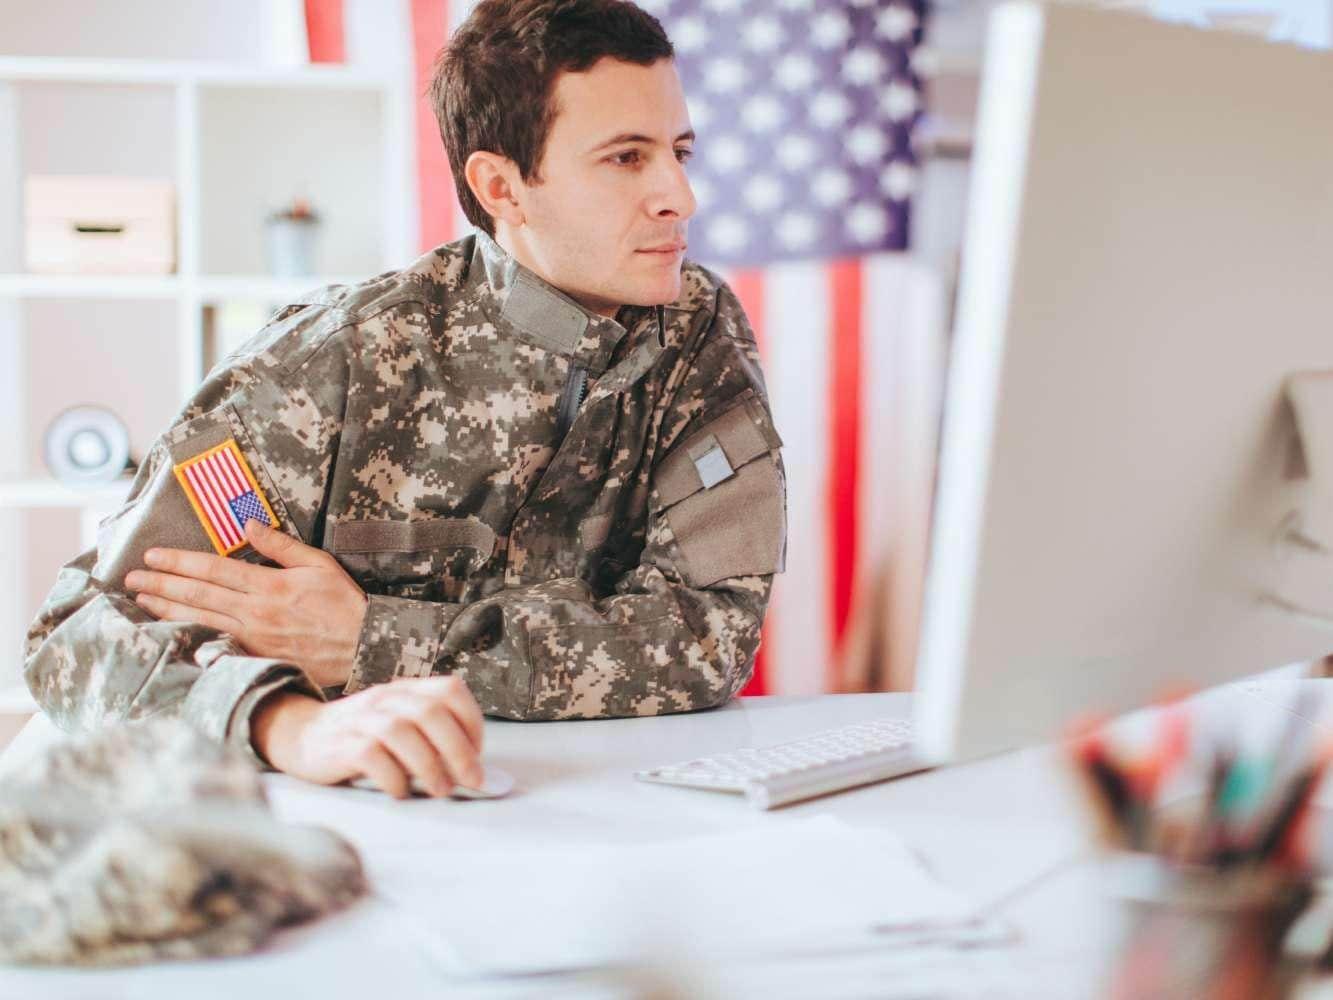 Man in military uniform working on desktop computer